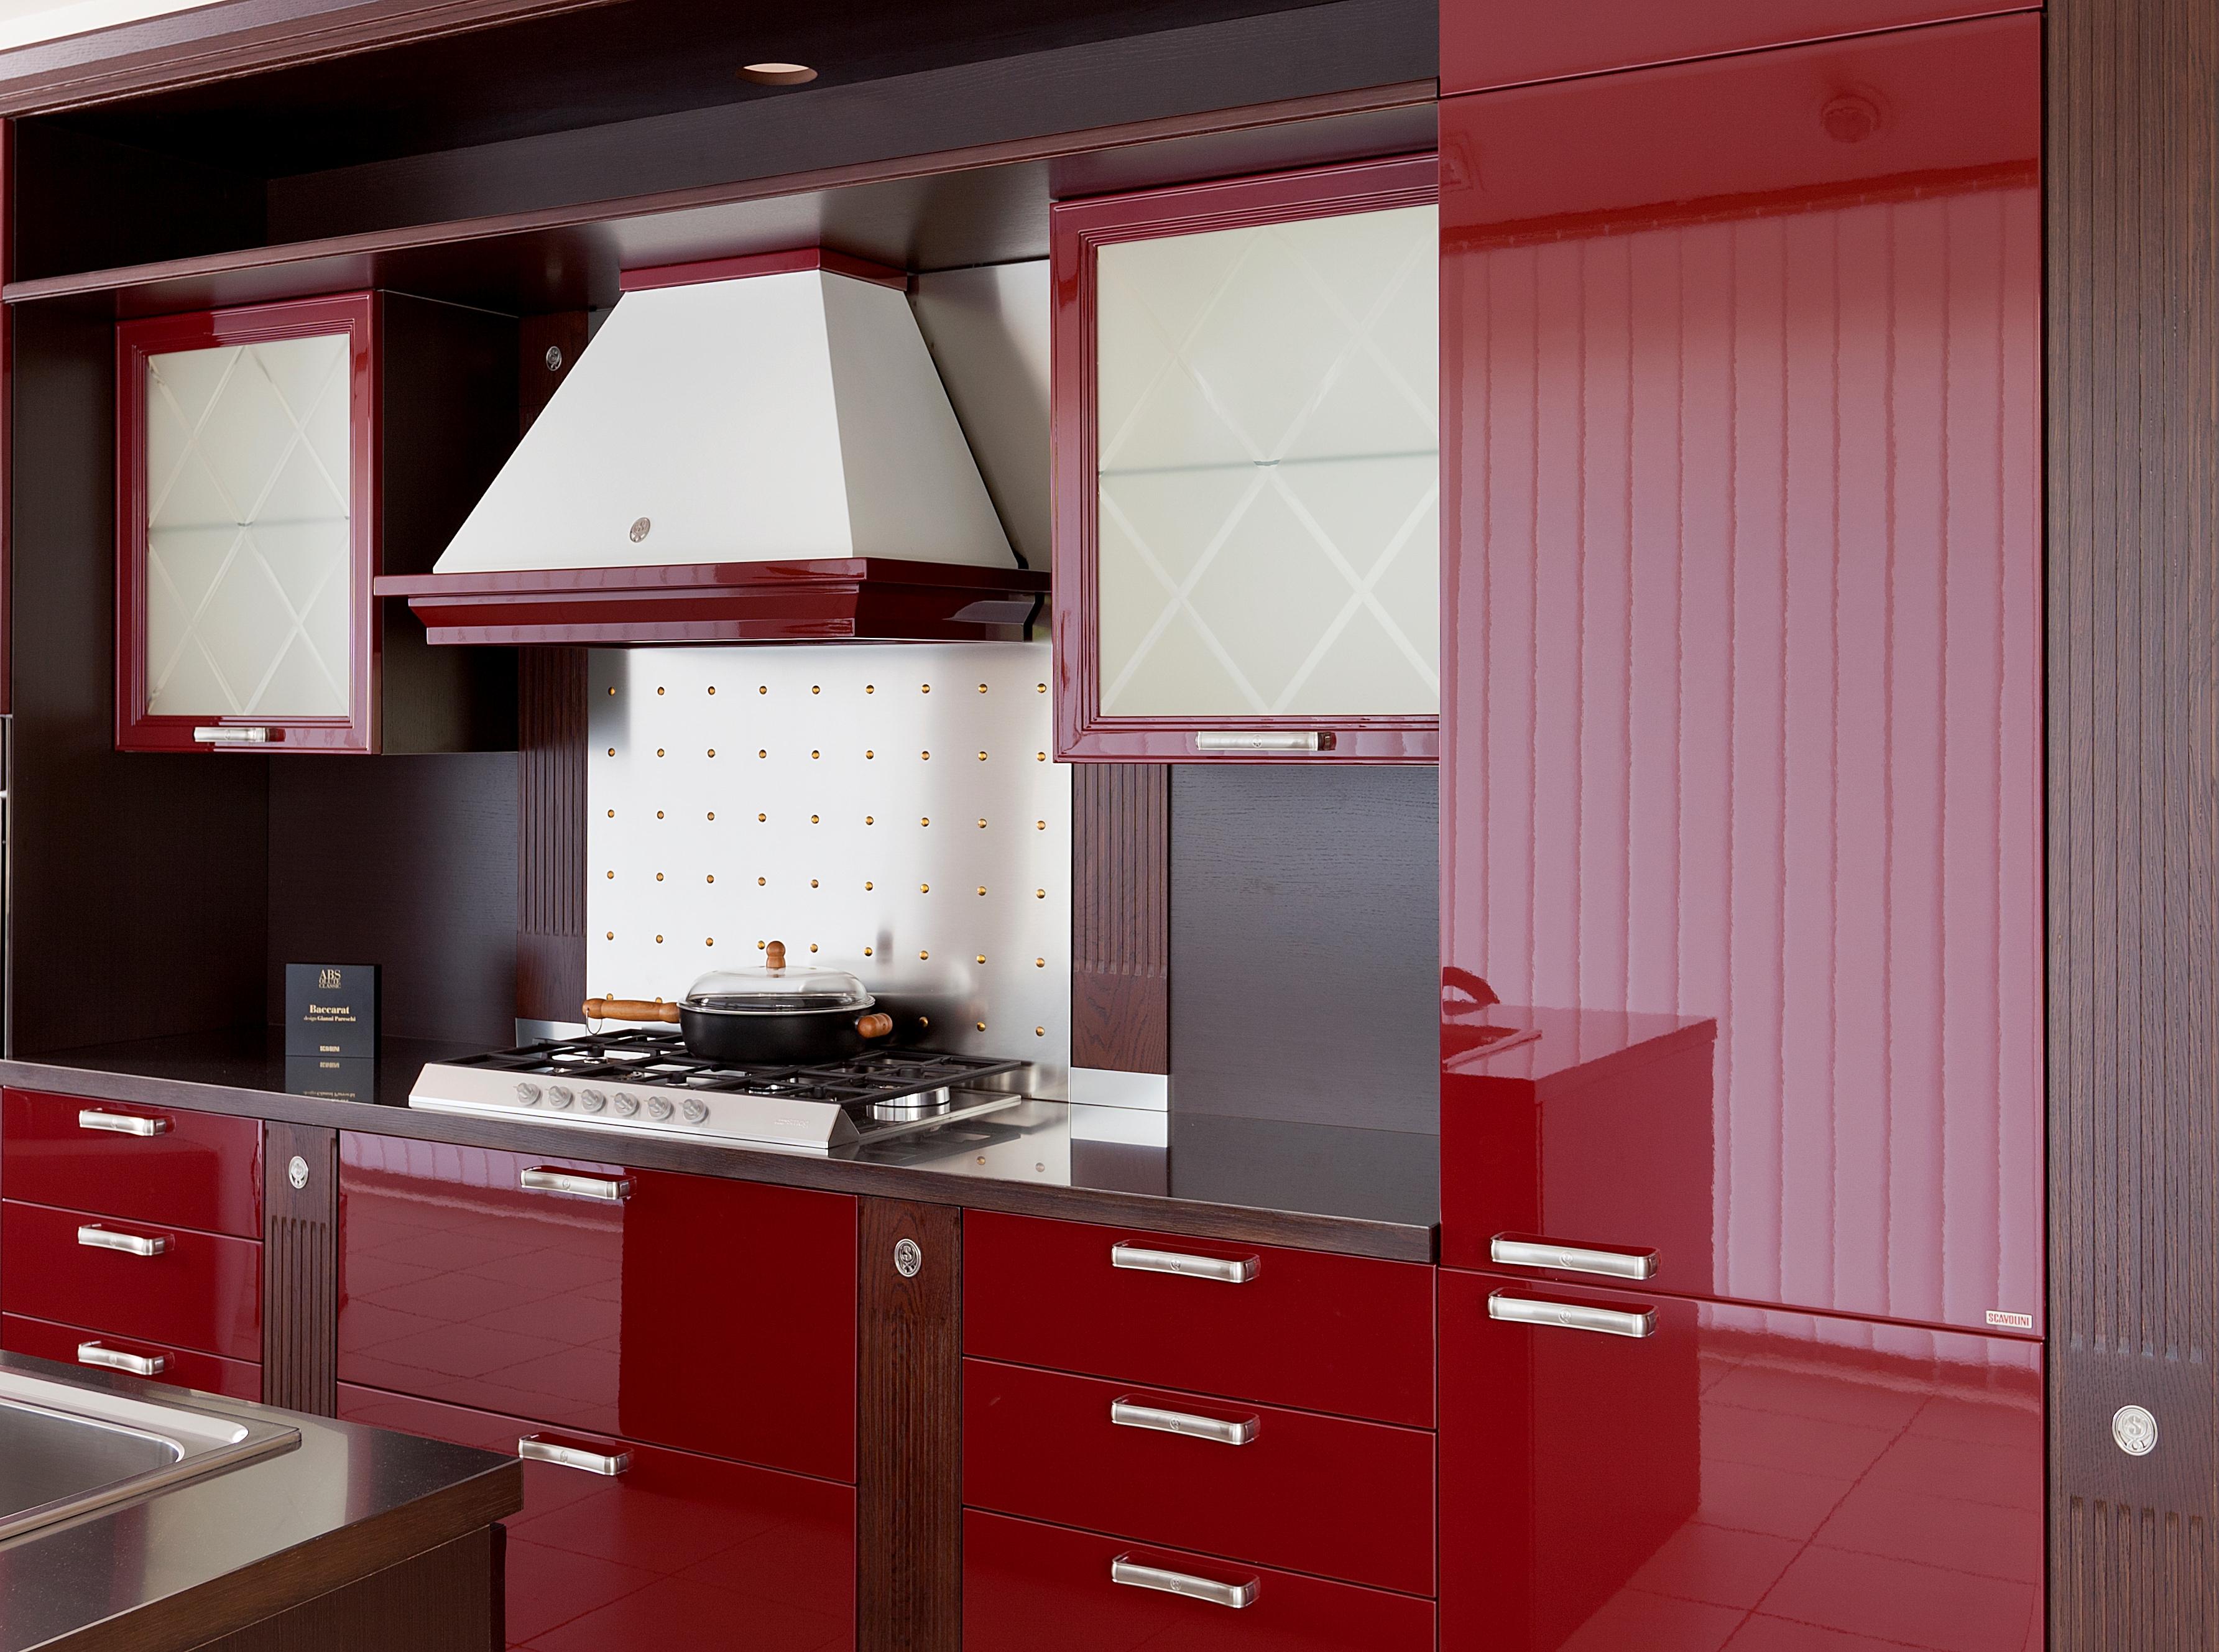 Comprare cucina cucina lucida melanzana bianco cucine a - Dove comprare cucina ...